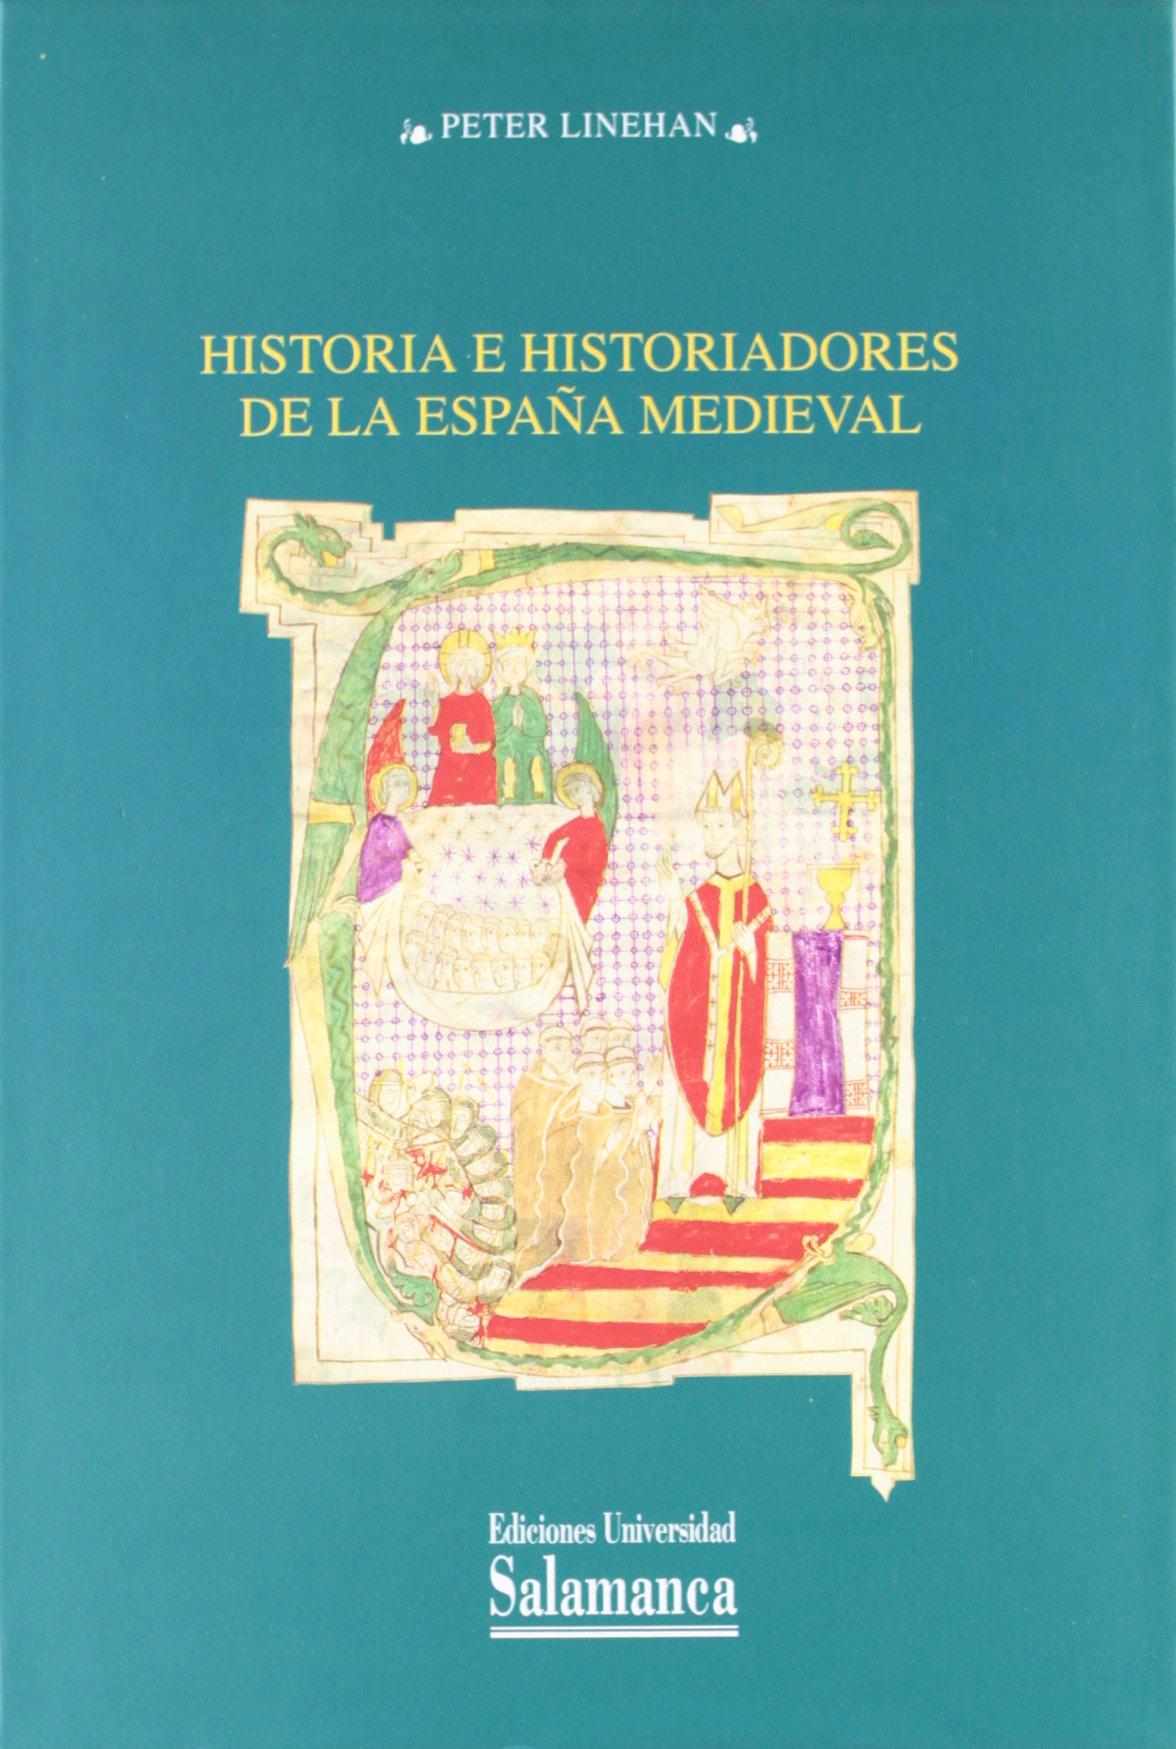 Historia E Historiadores De La España Medieval: Amazon.es: Linehan, Peter: Libros